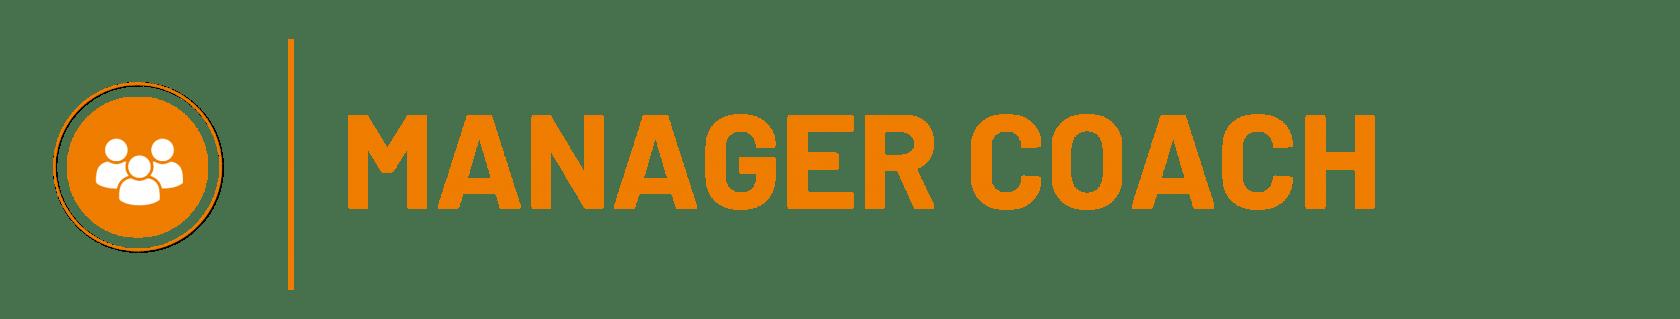 Header MANAGERCOACHcerchio-01